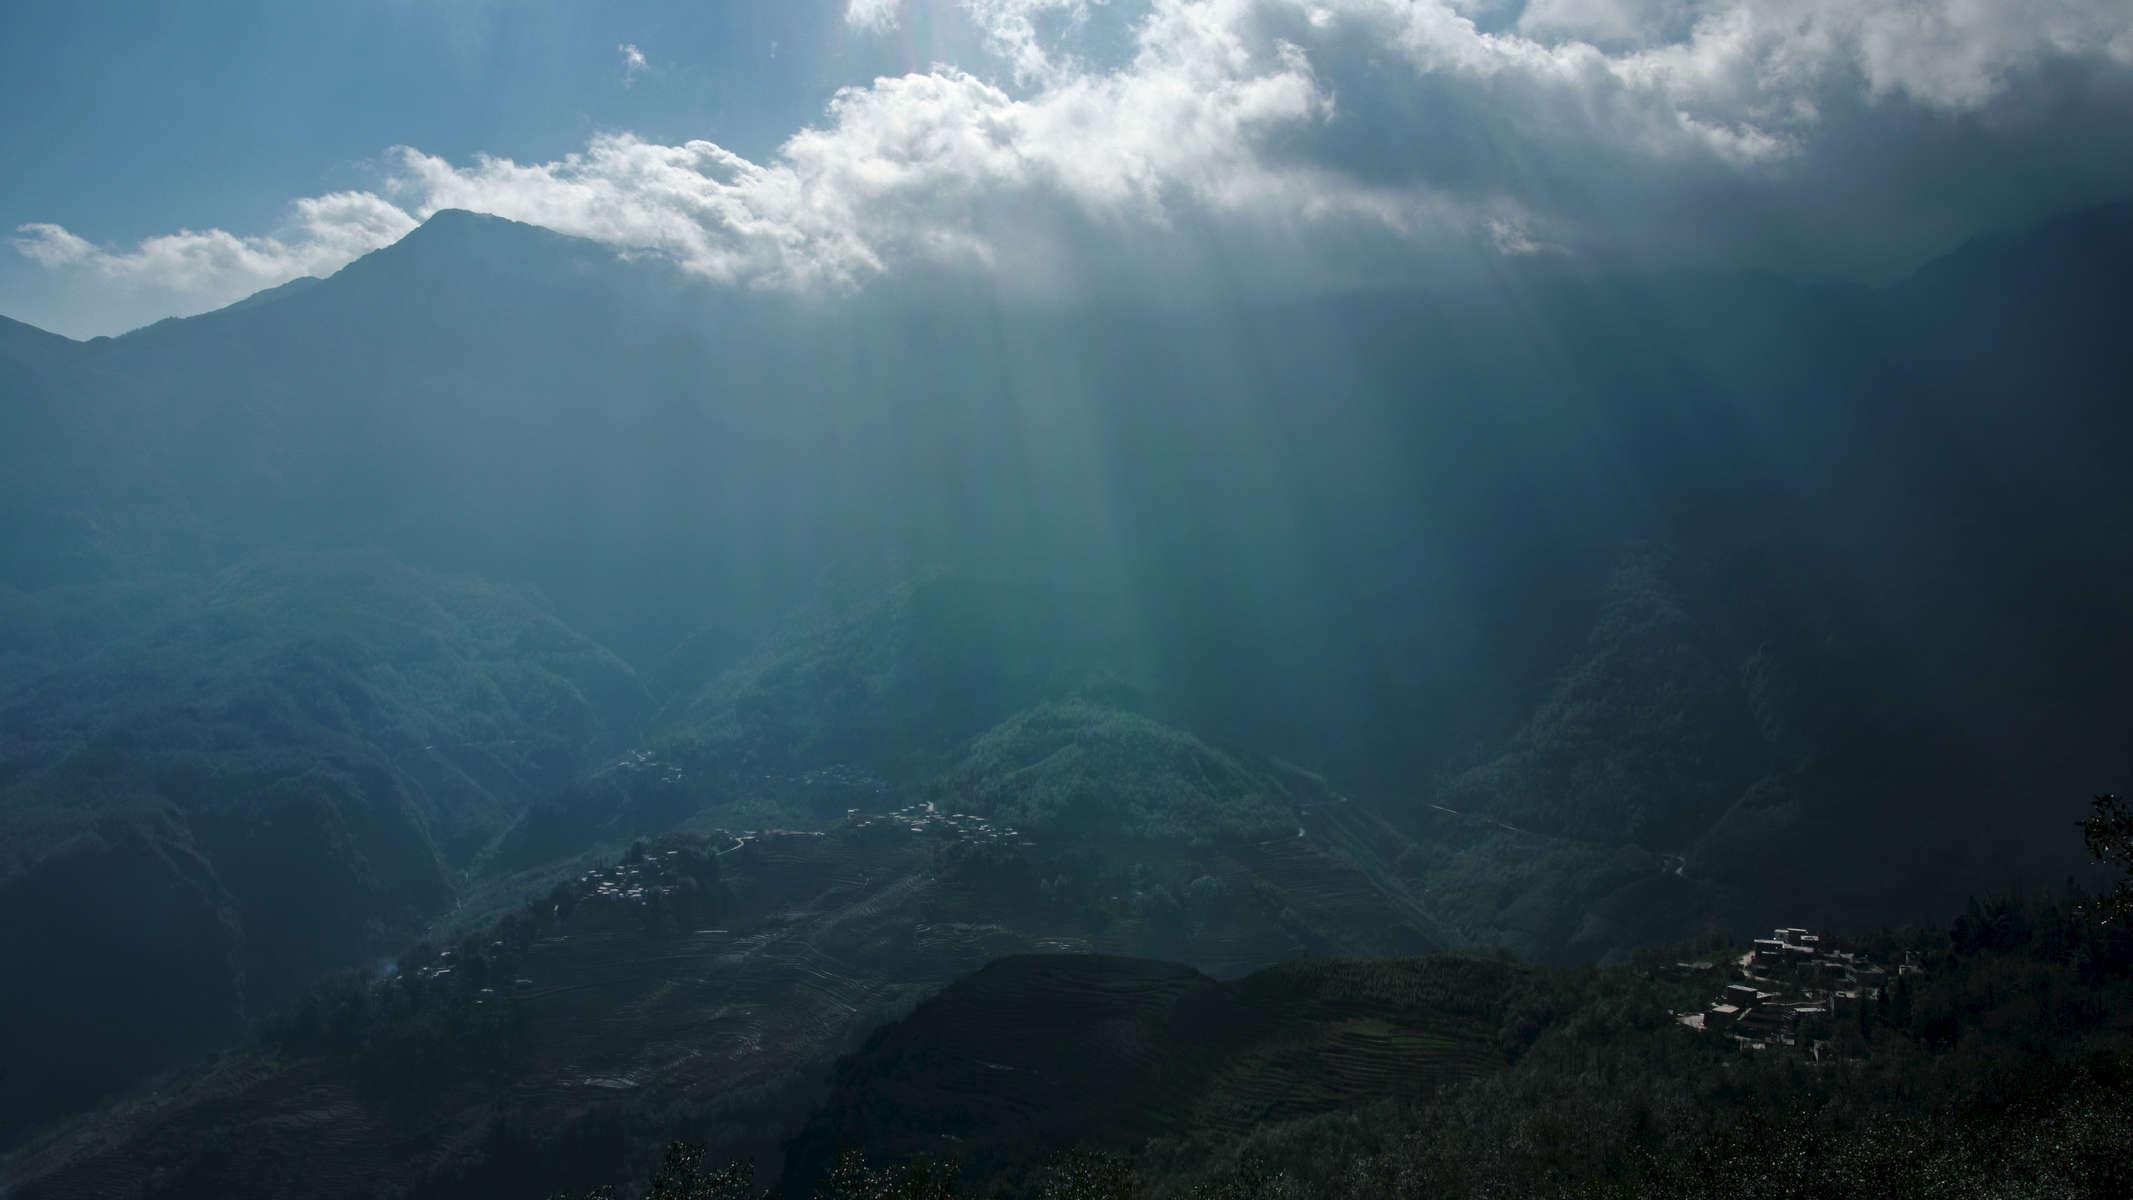 China-Yunnan-Hani-Rice-Terraces-Photo-by-Cyril-Eberle-A7S-Still-001